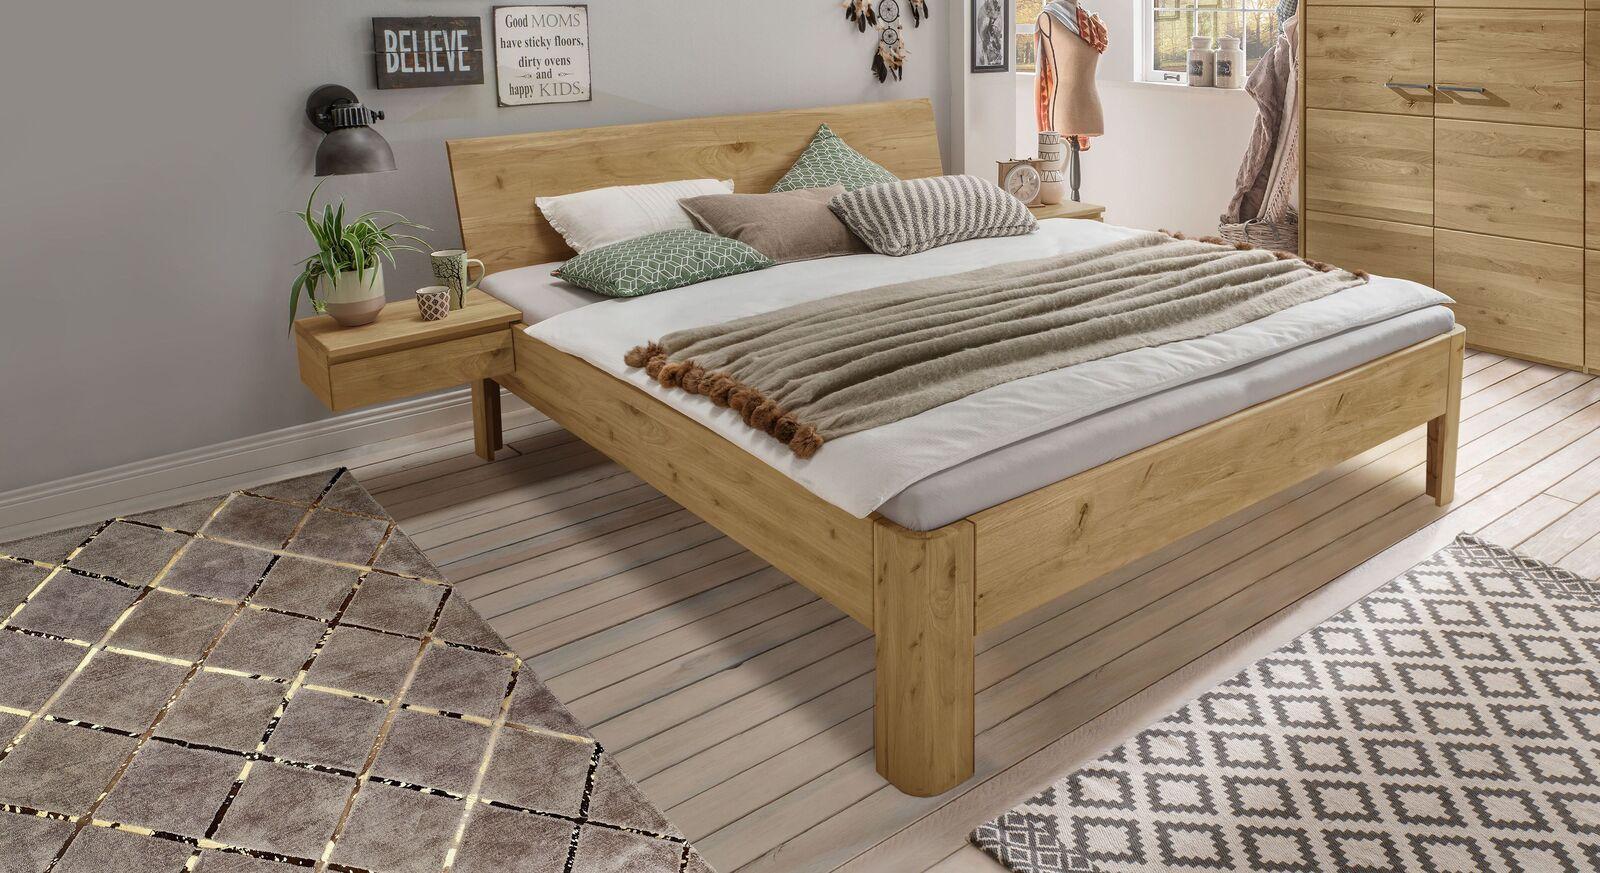 Bio-Bett Wila metallfrei aus Echtholz